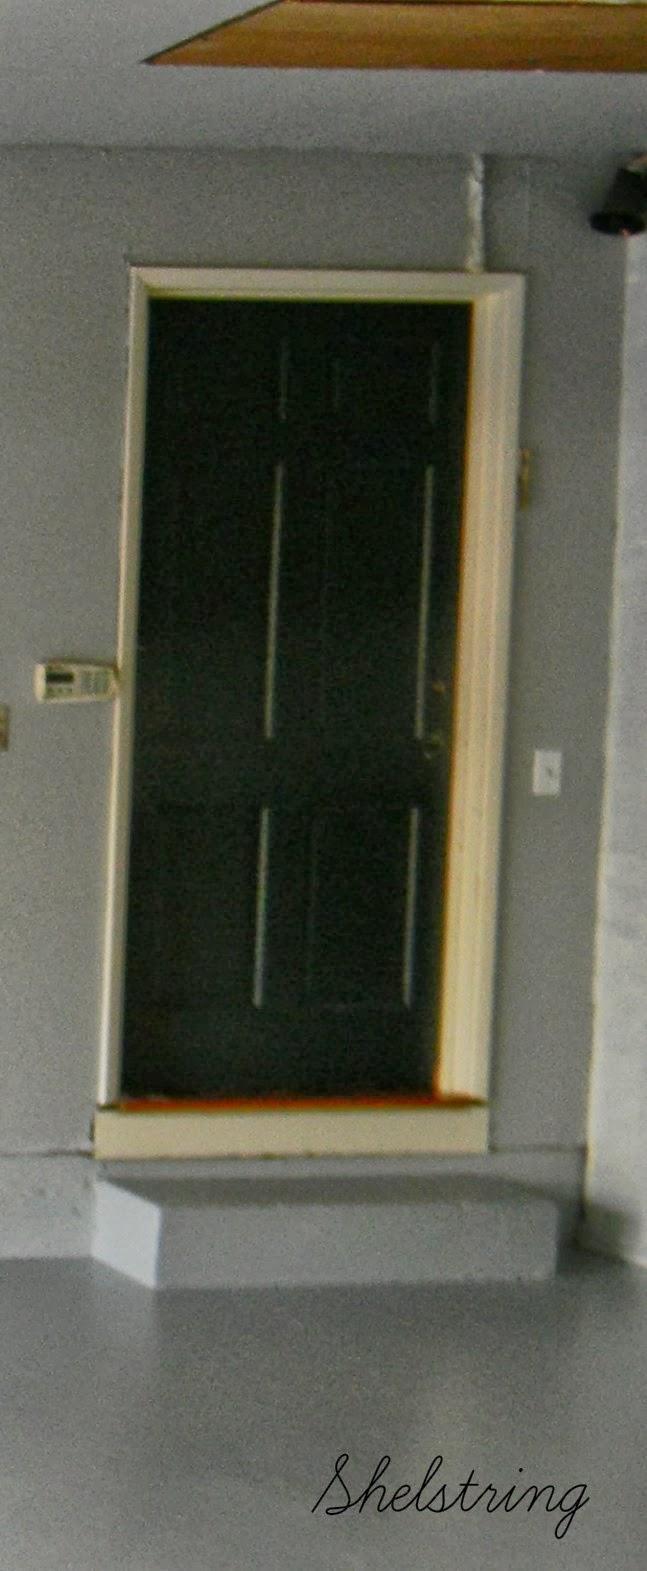 Shelstring Blog 31 Day Challenge Garage Door Completion